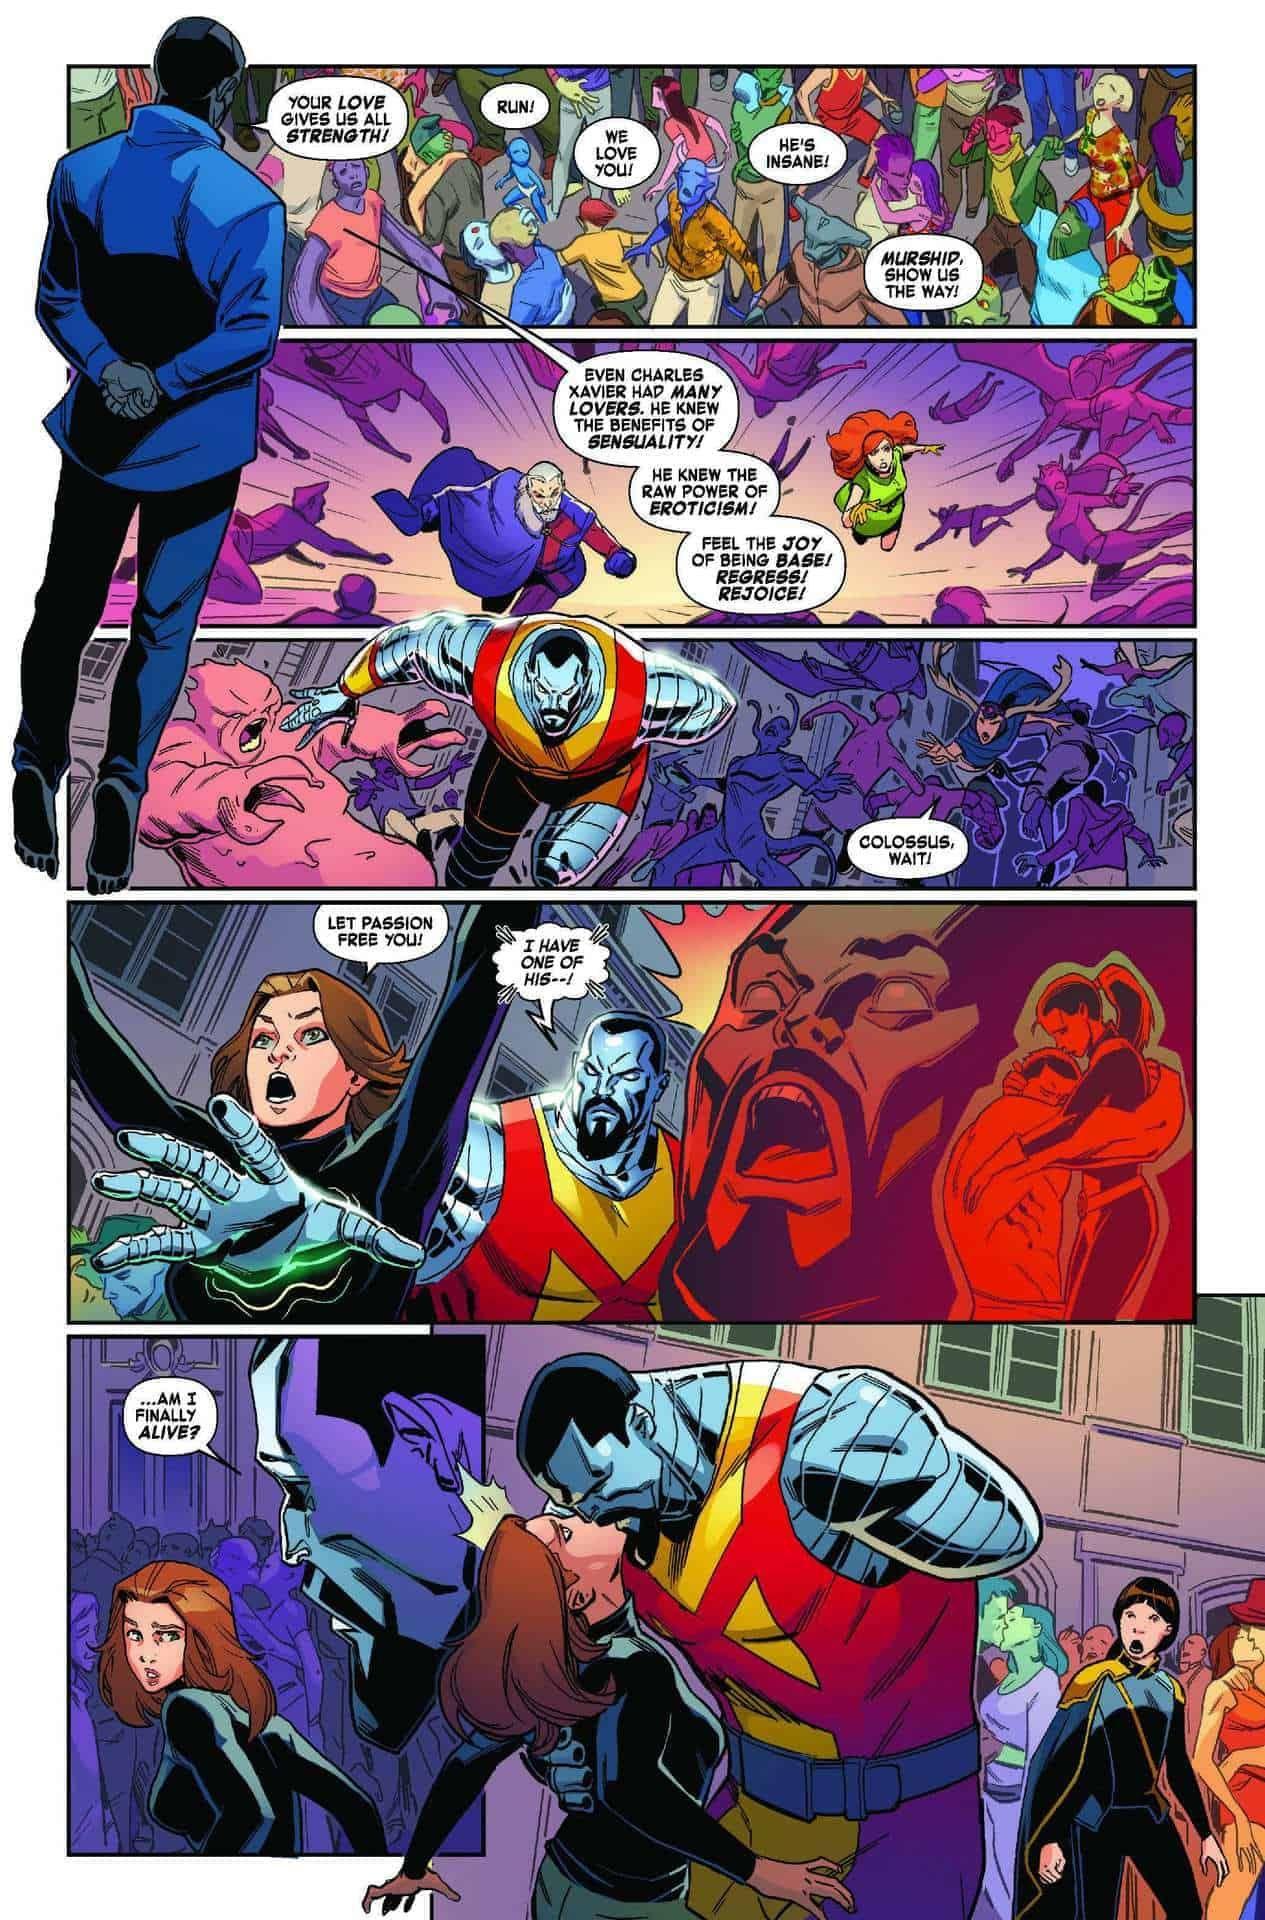 Age Of X Man The Marvelous X Men 4 Preview Brings Out New Old Feelings X Men Xmen Comics Xmen Art